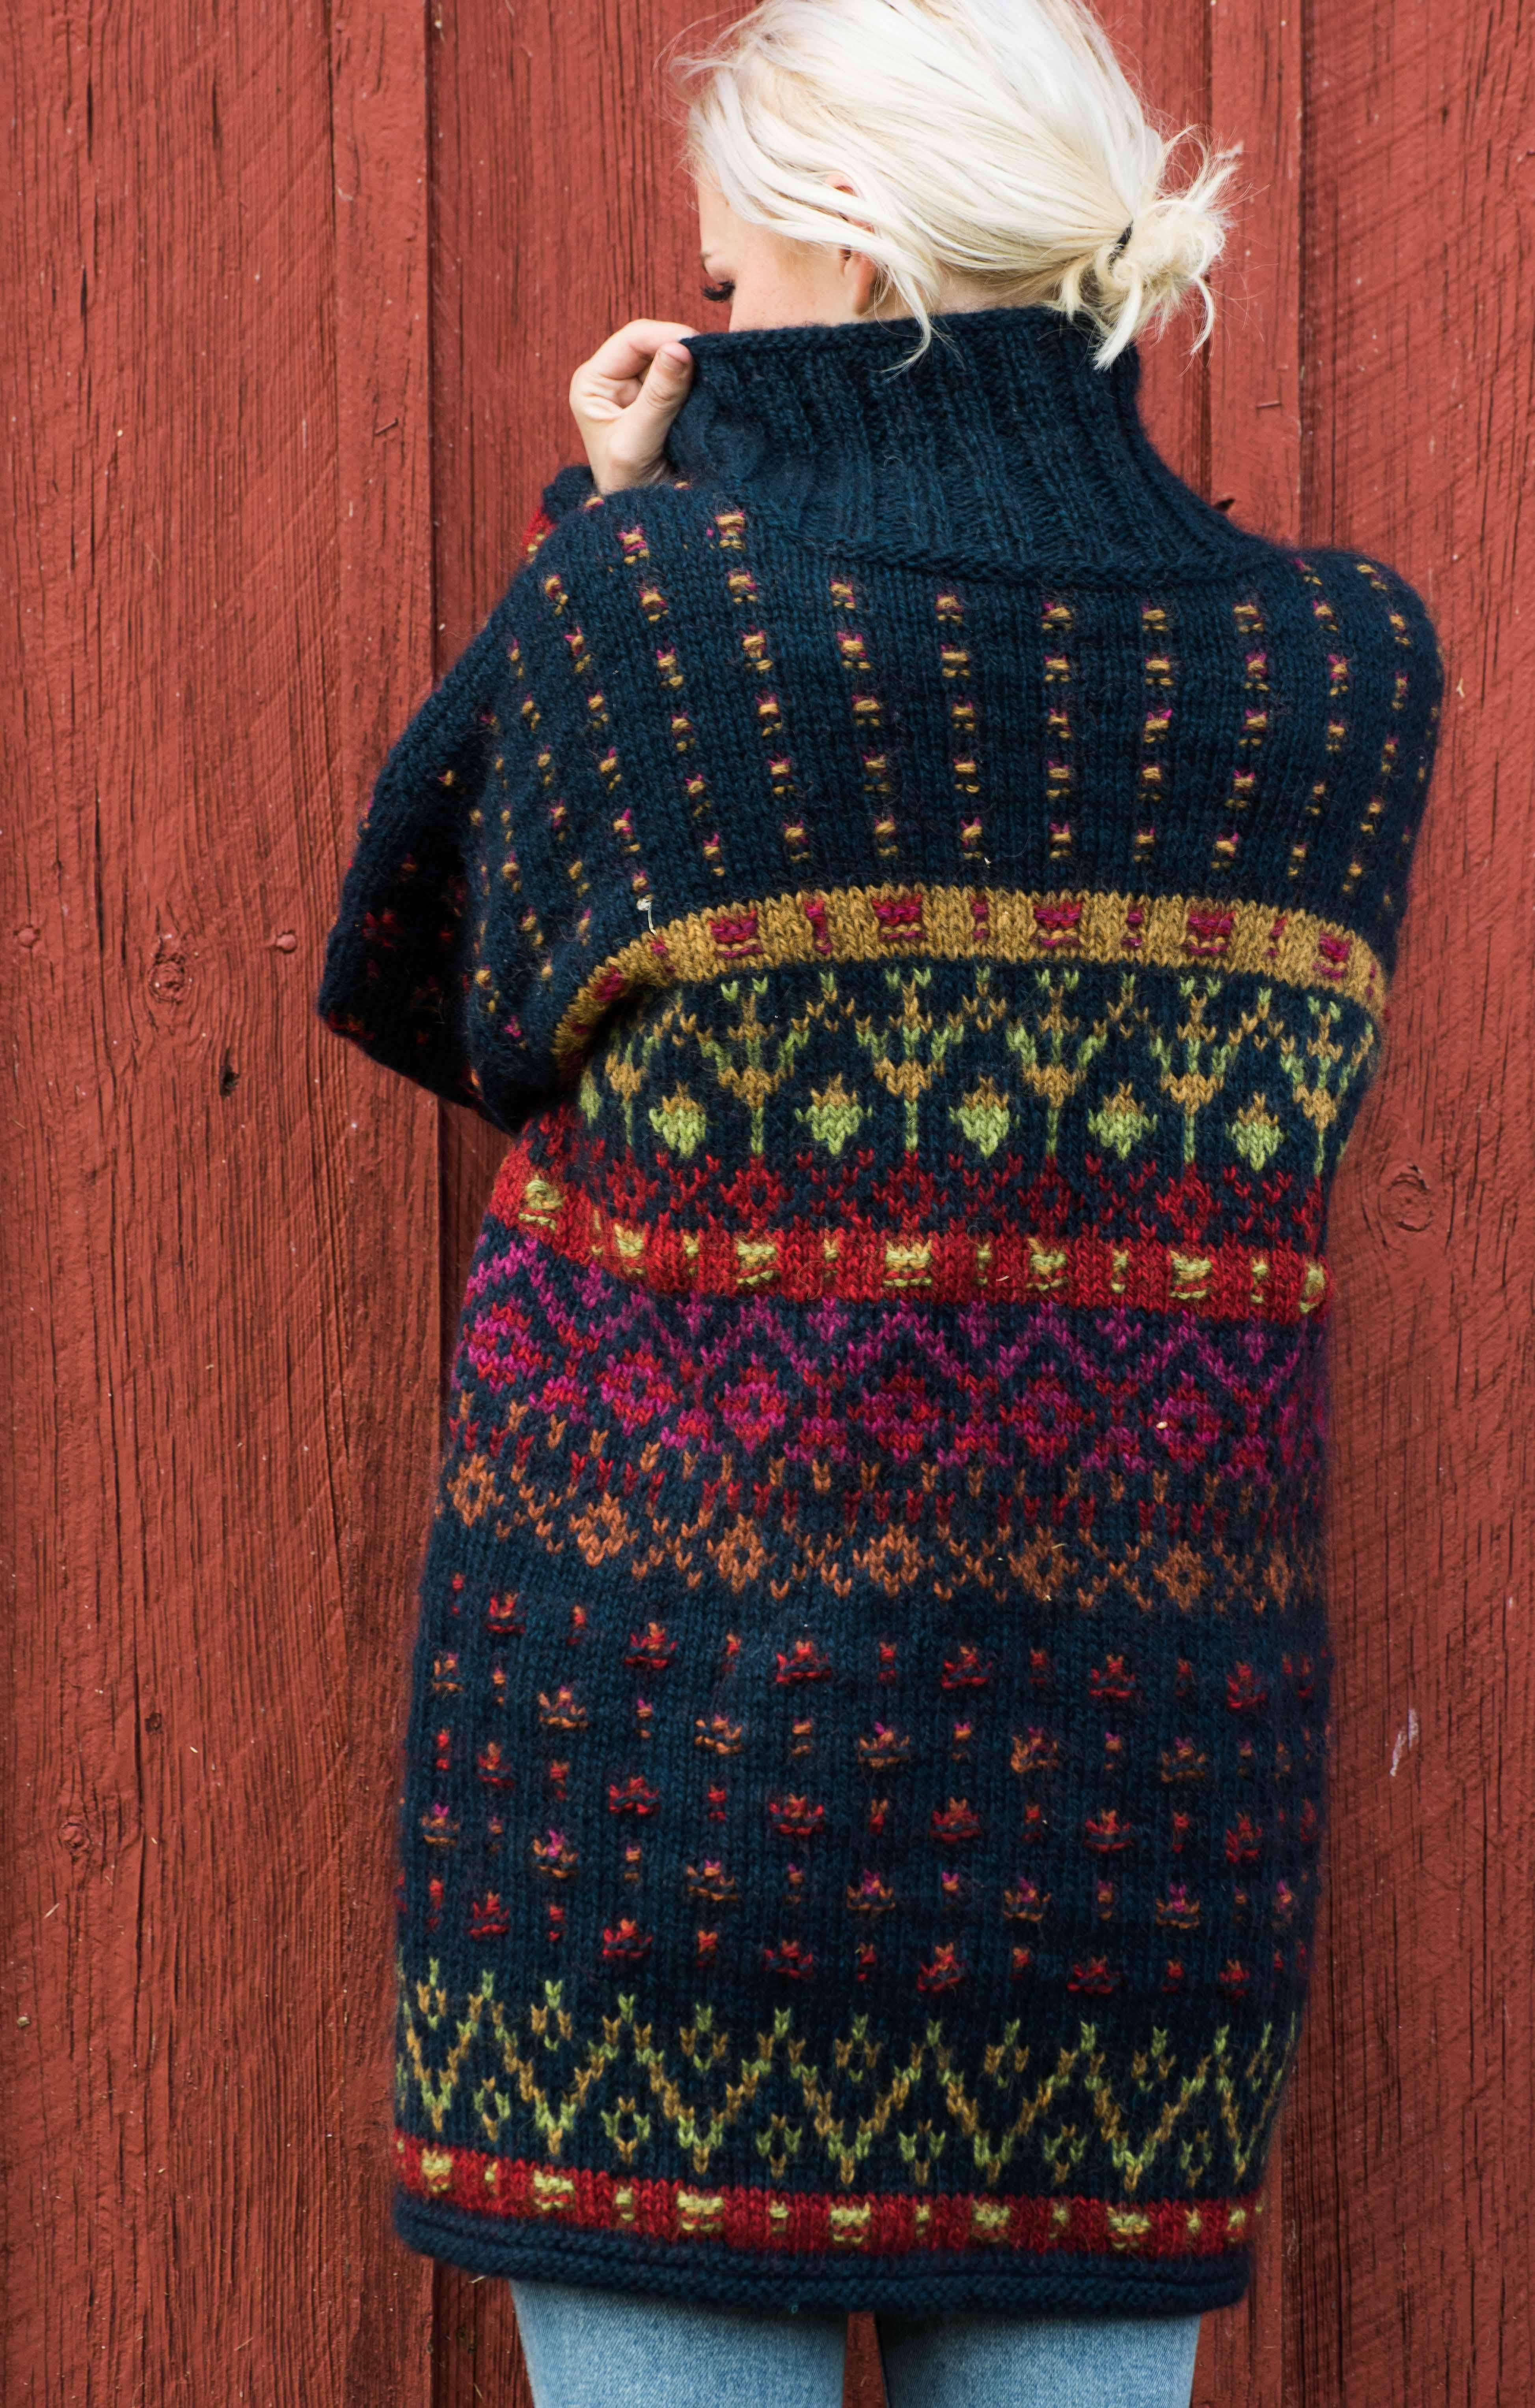 DSC_2517Fridas meksikanske jakke